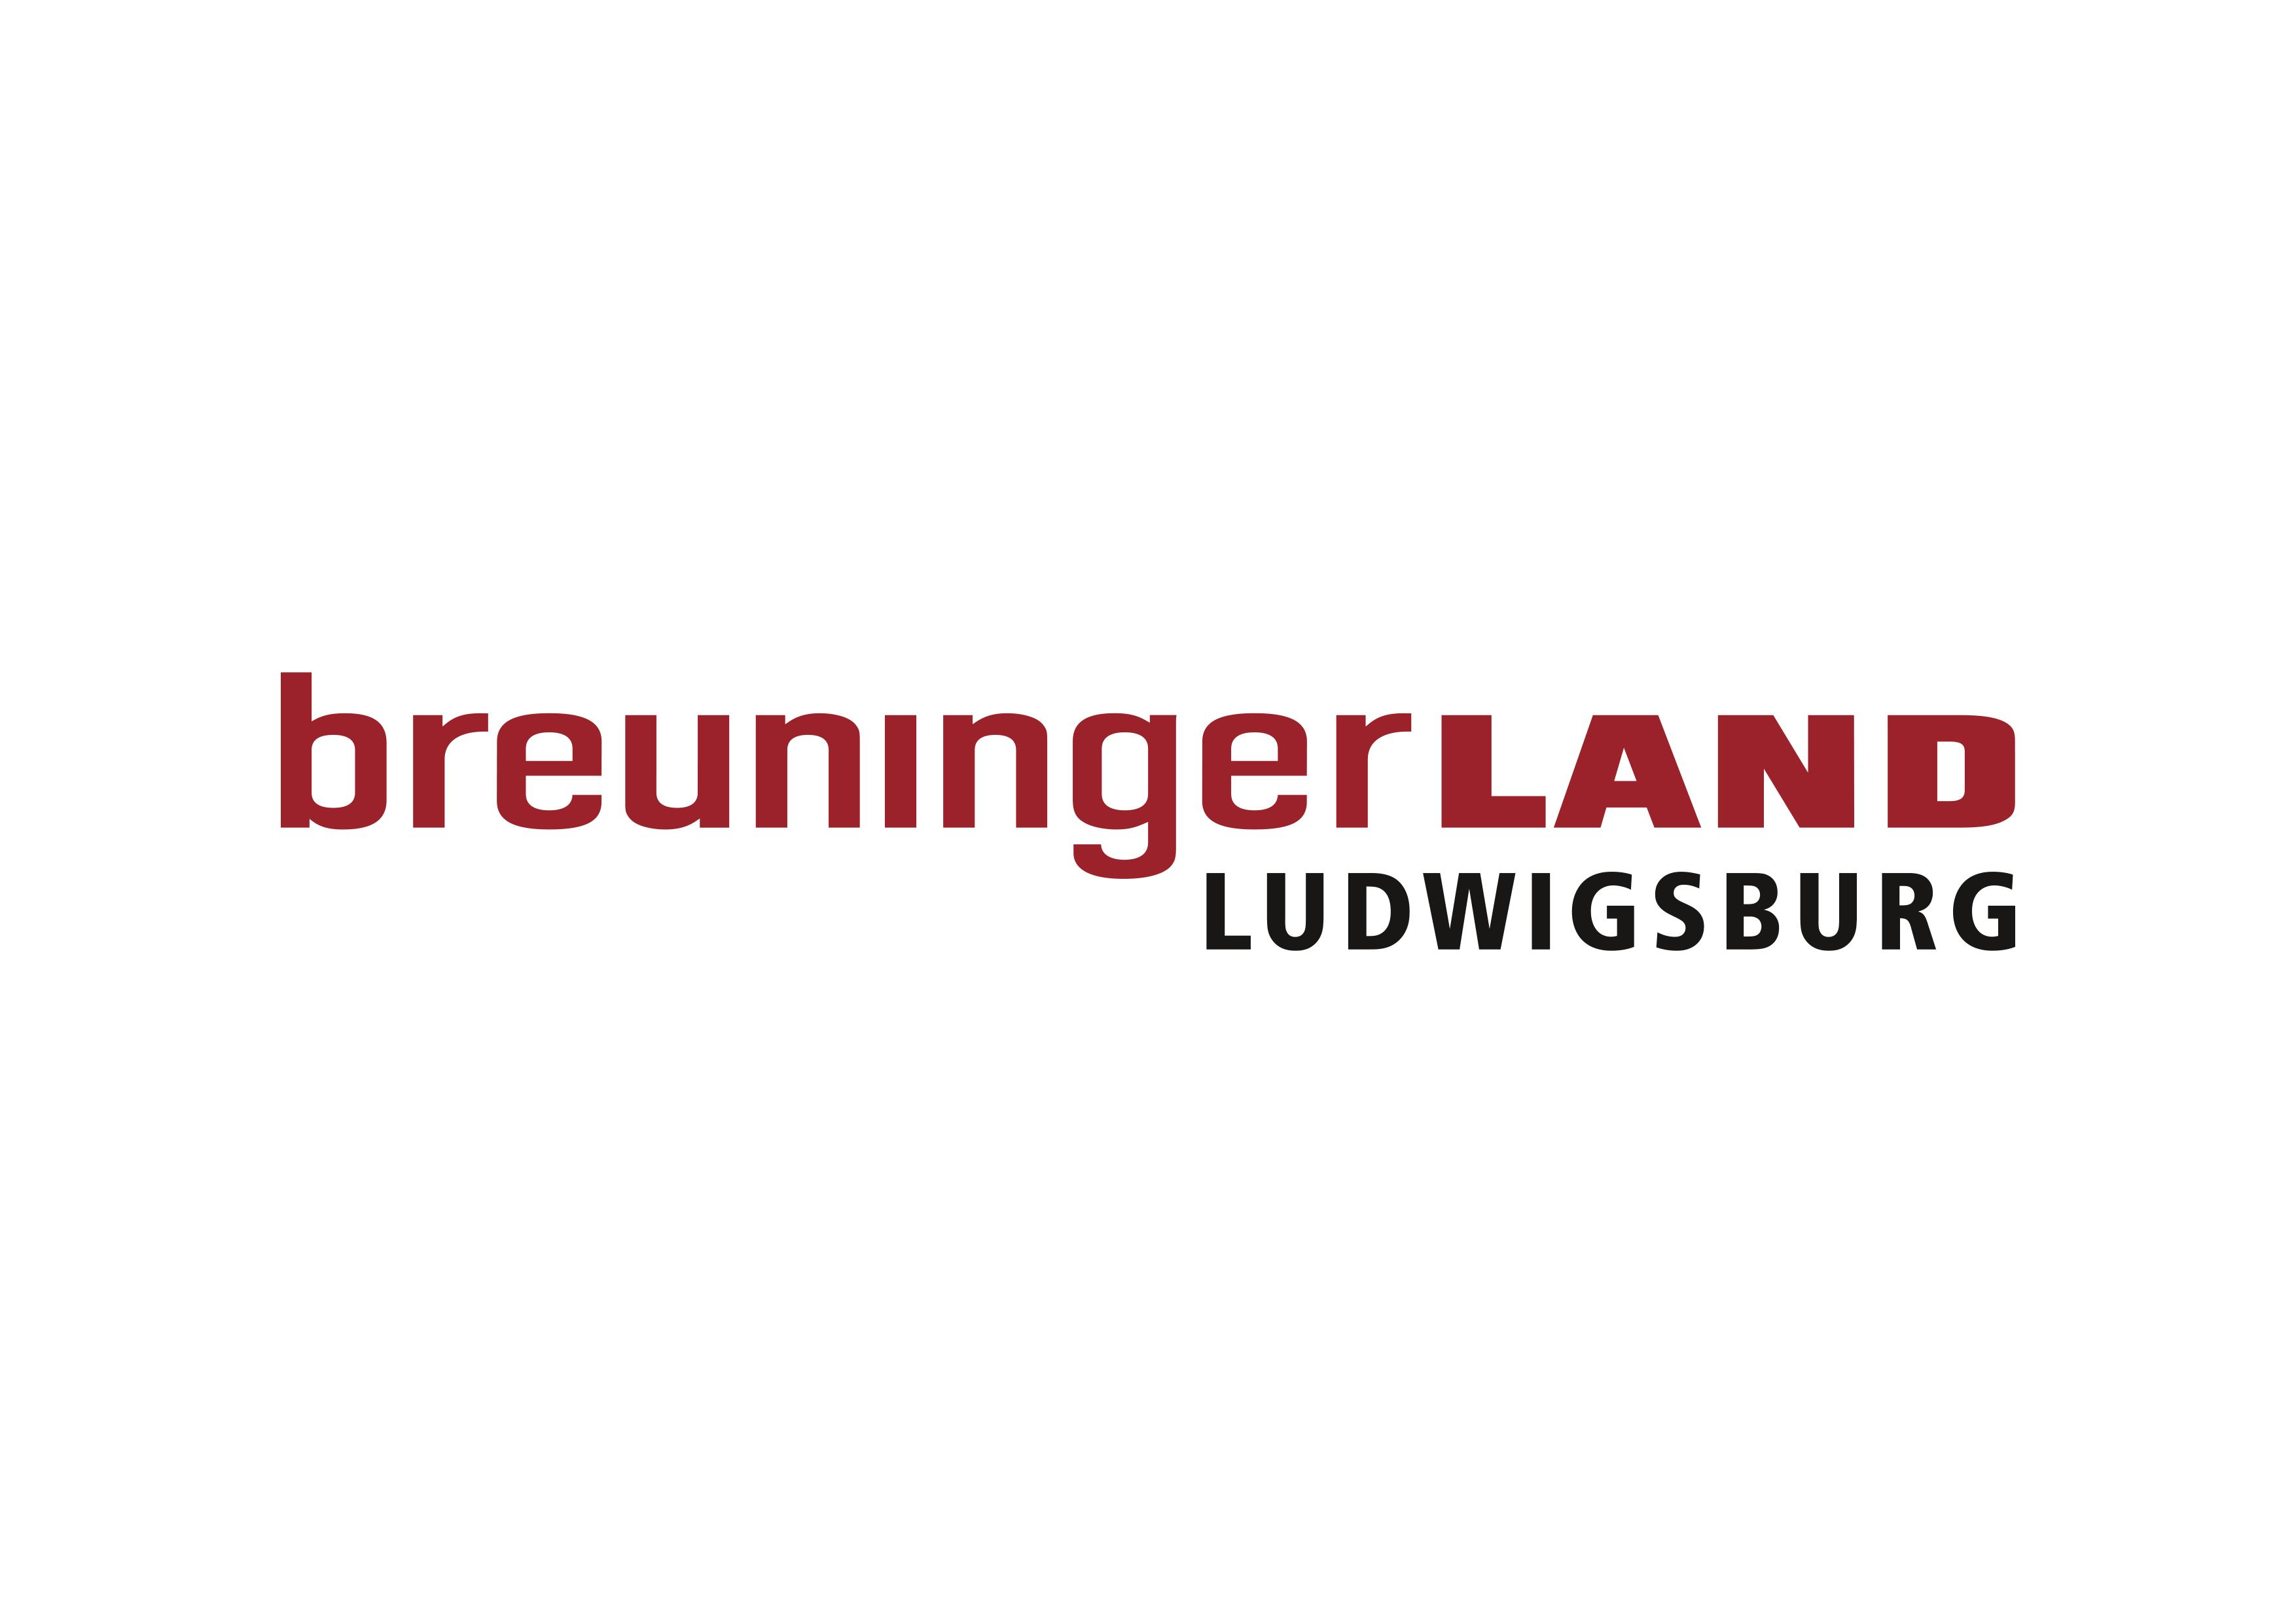 BreuningerLAND Ludwigsburg Logo